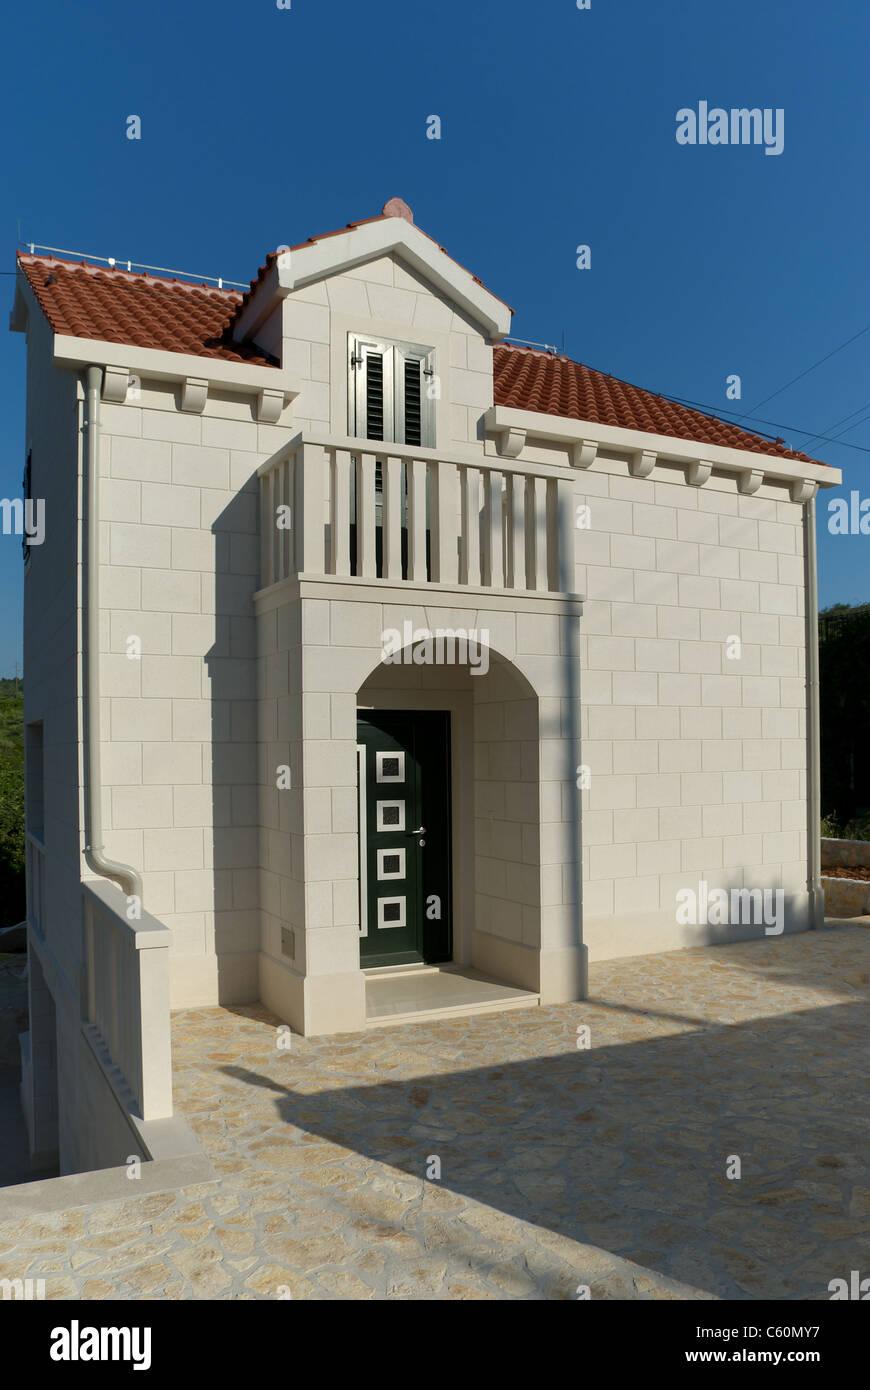 House of white stone - Stock Image